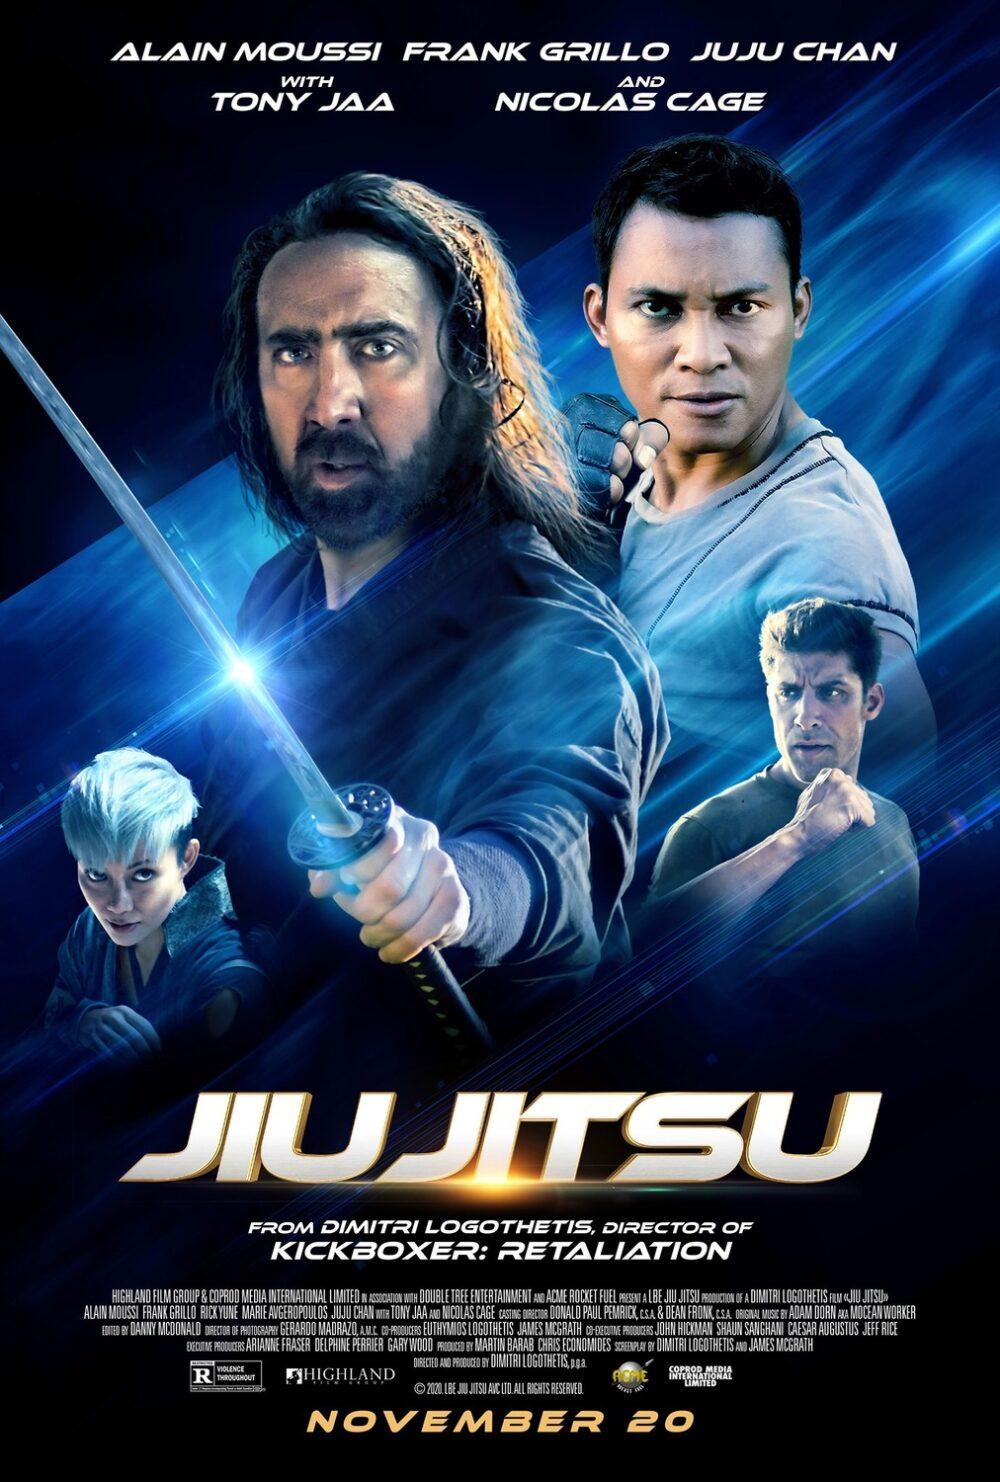 jiu-jitsu-nuovo-trailer-dellaction-fantascientifico-con-nicolas-cage-e-tony-jaa